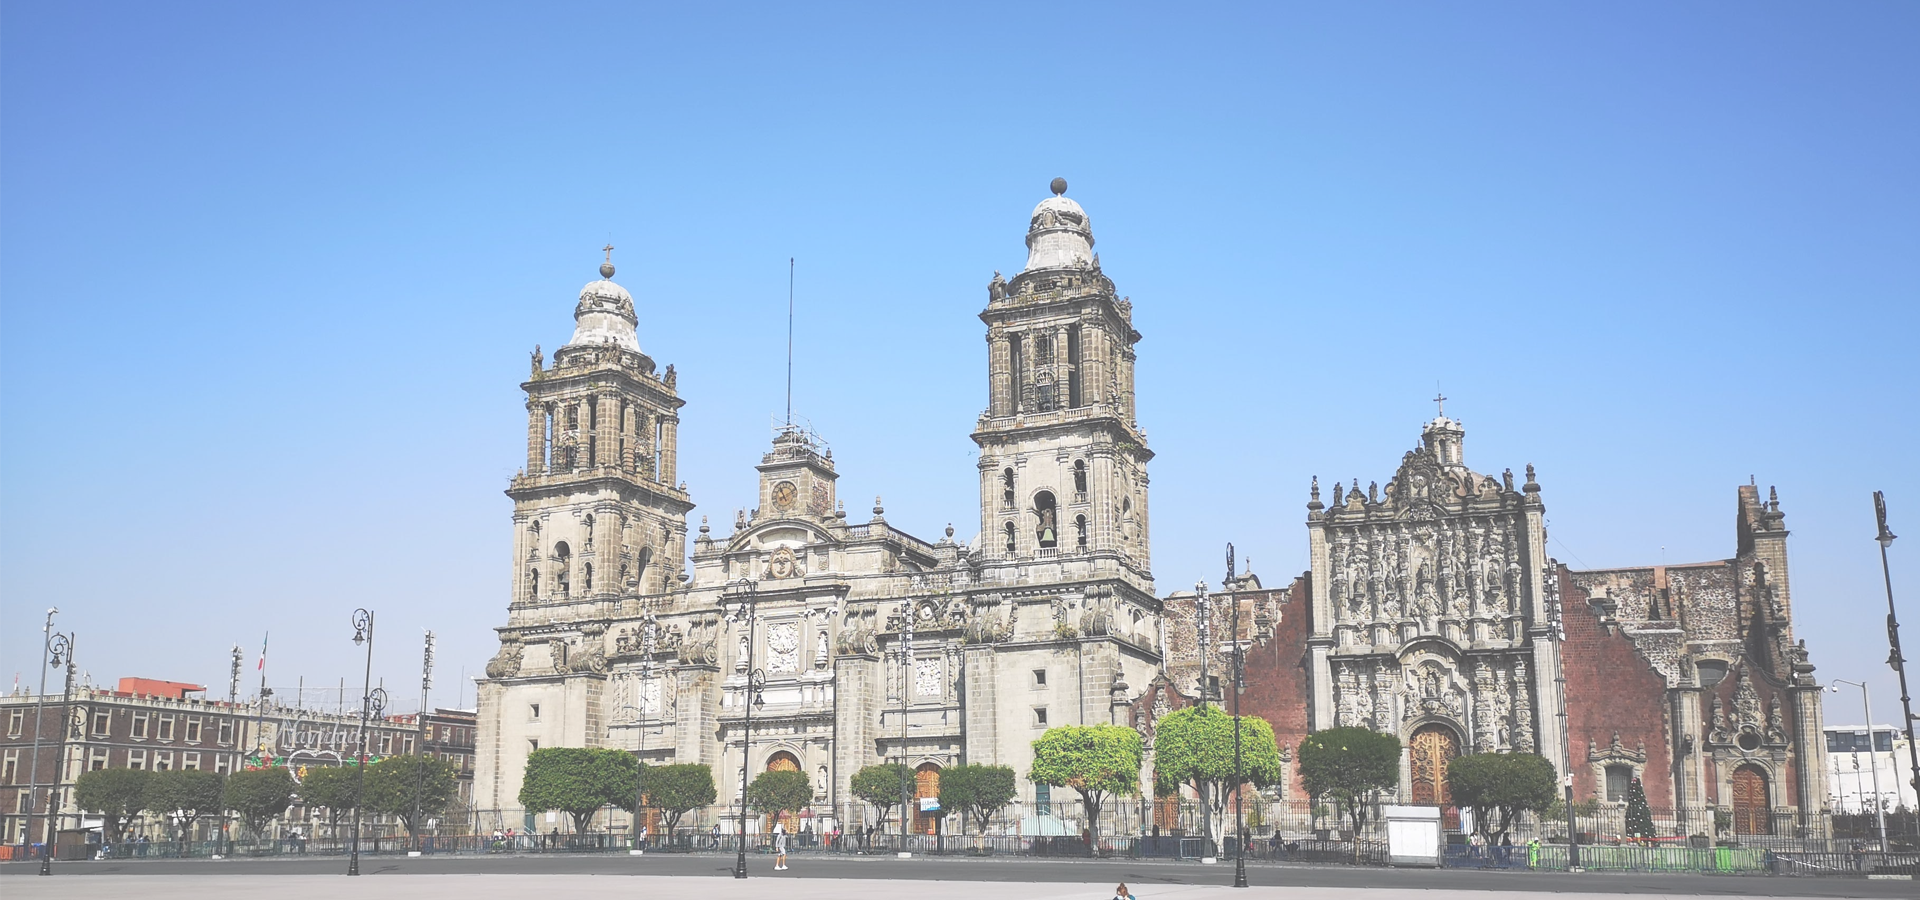 Centro Histórico, Centro, Mexico City, CDMX, Mexico